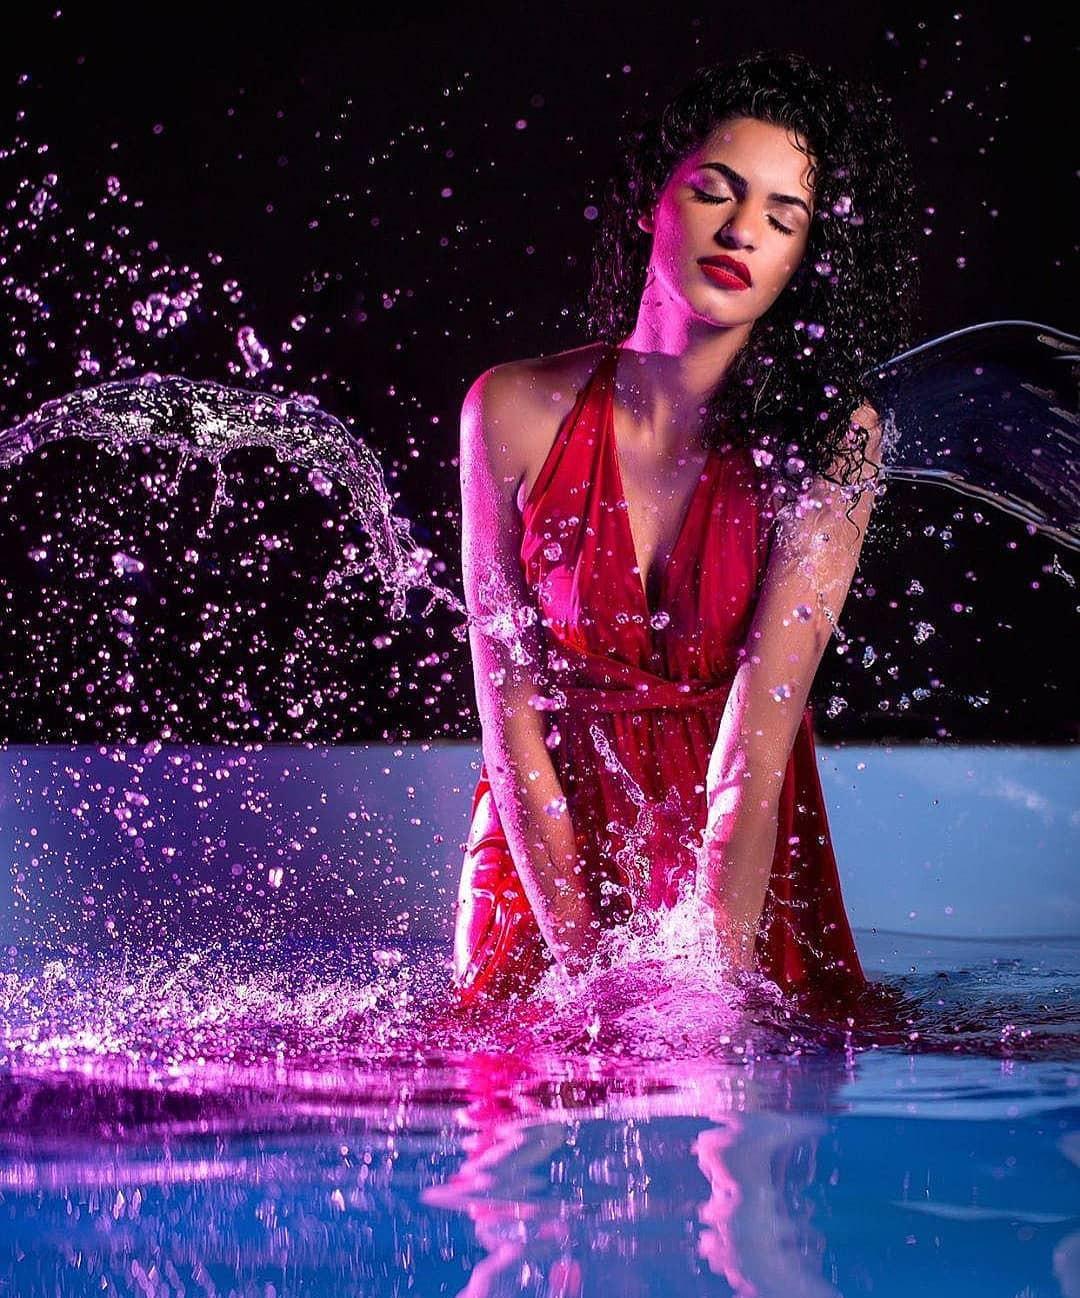 geicyelly mendes, top 20 de miss brasil mundo 2019. - Página 2 Fh8dqa10